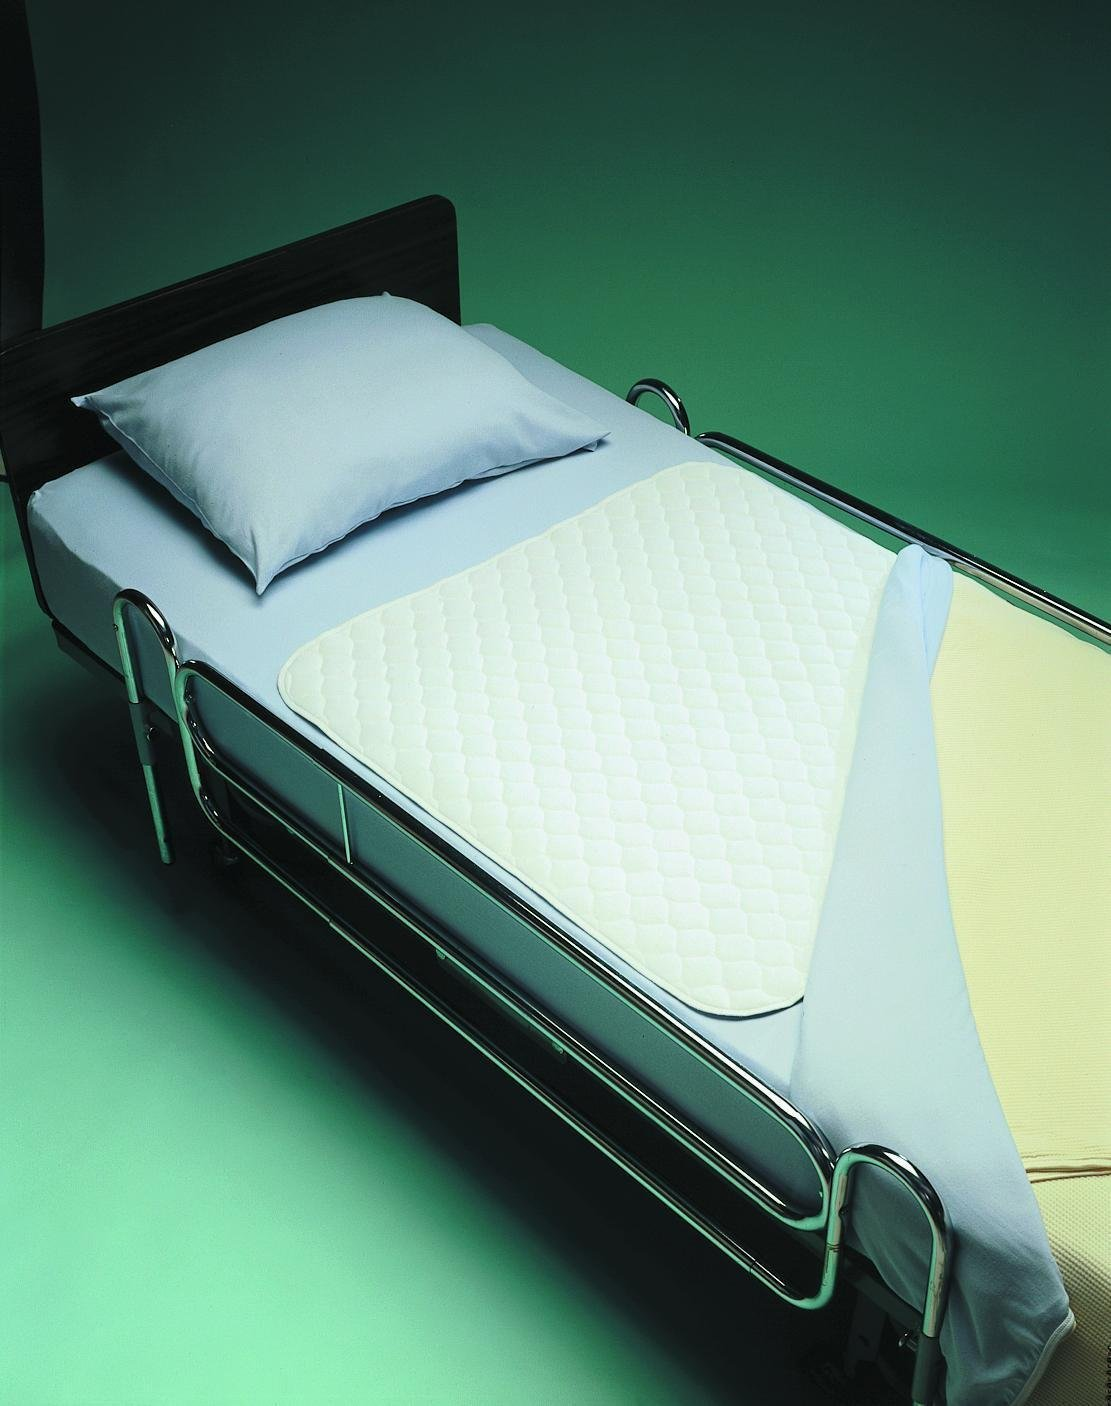 - Amazon.com: Reusable Bedpads: Industrial & Scientific